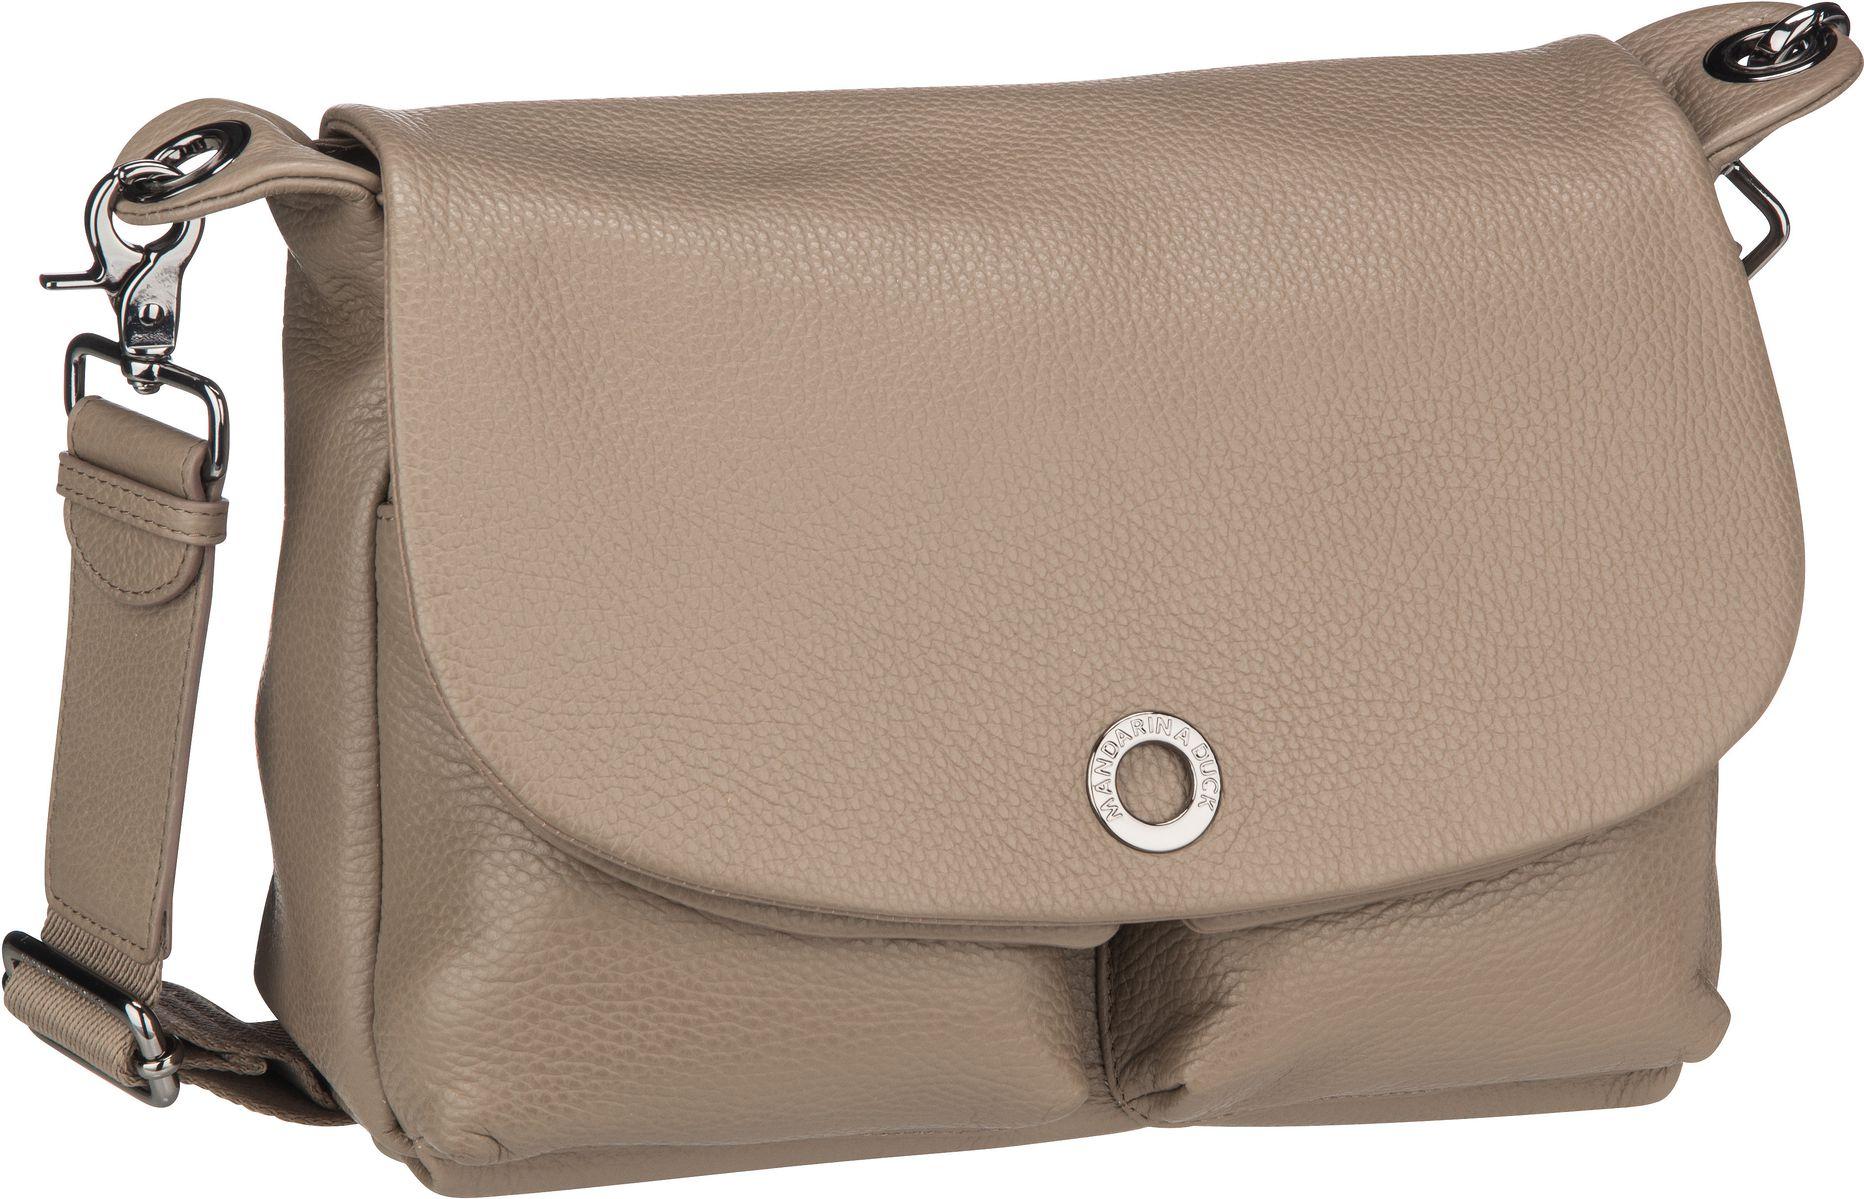 Umhängetasche Mellow Leather Shoulder Bag FZT23 Amphora